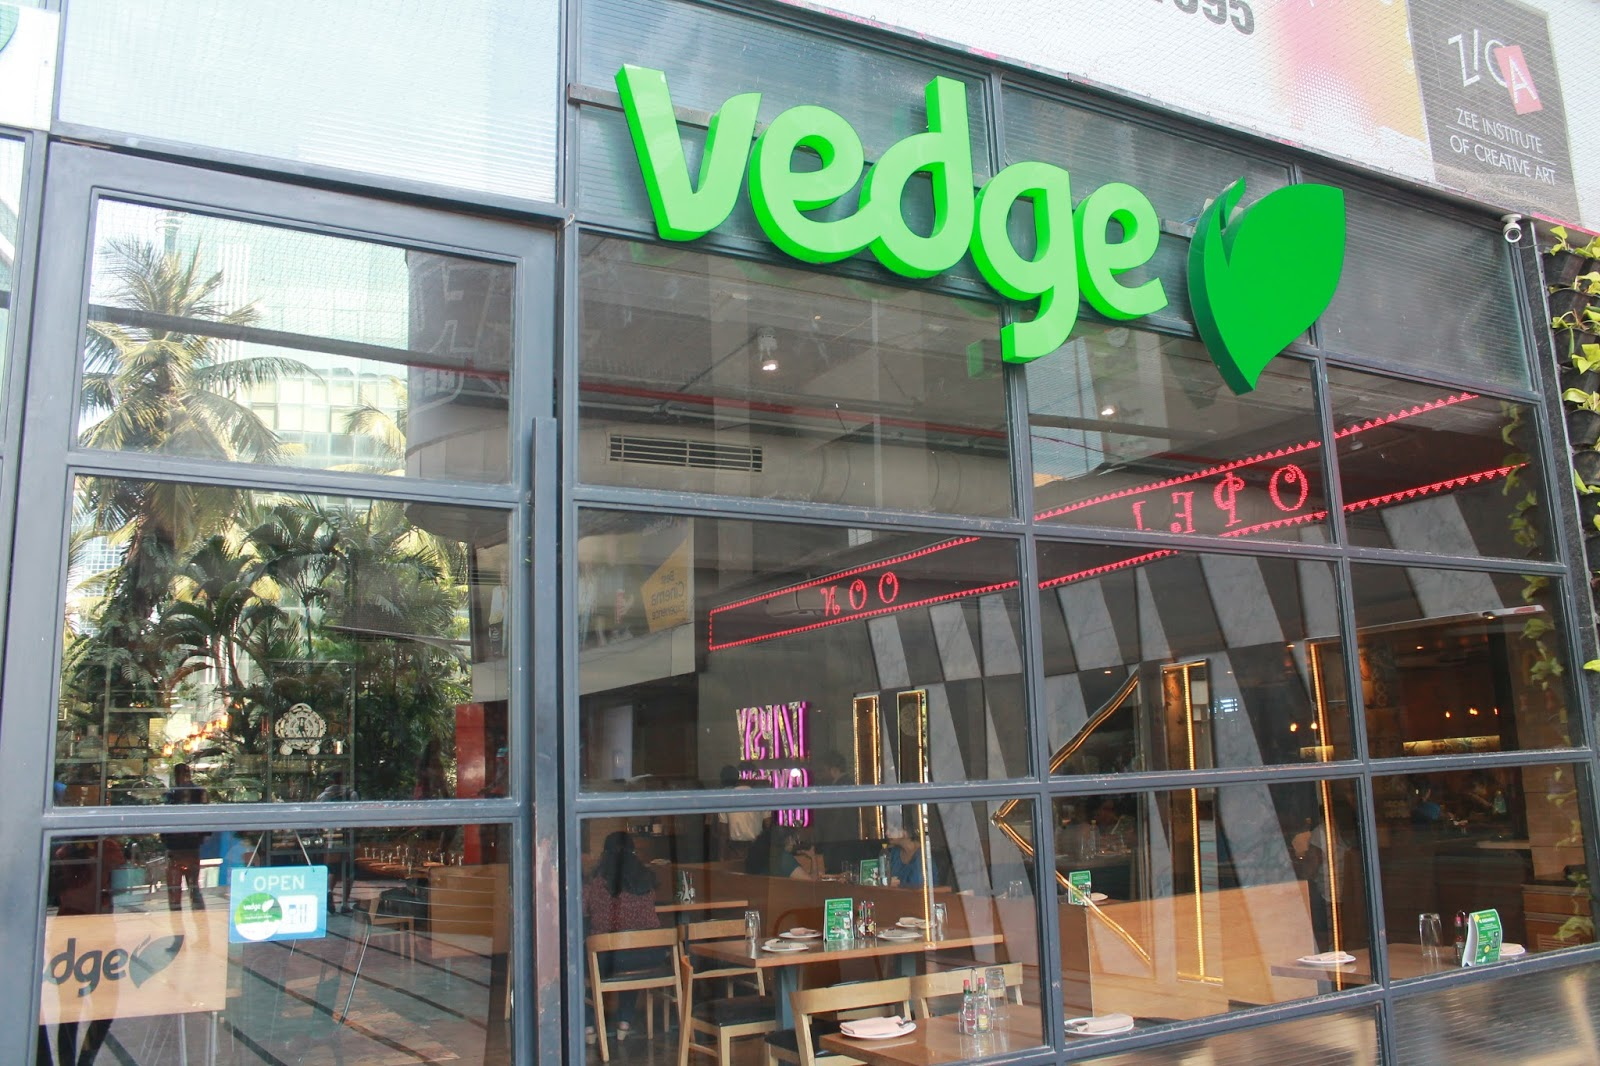 Dating vegetarian restaurant